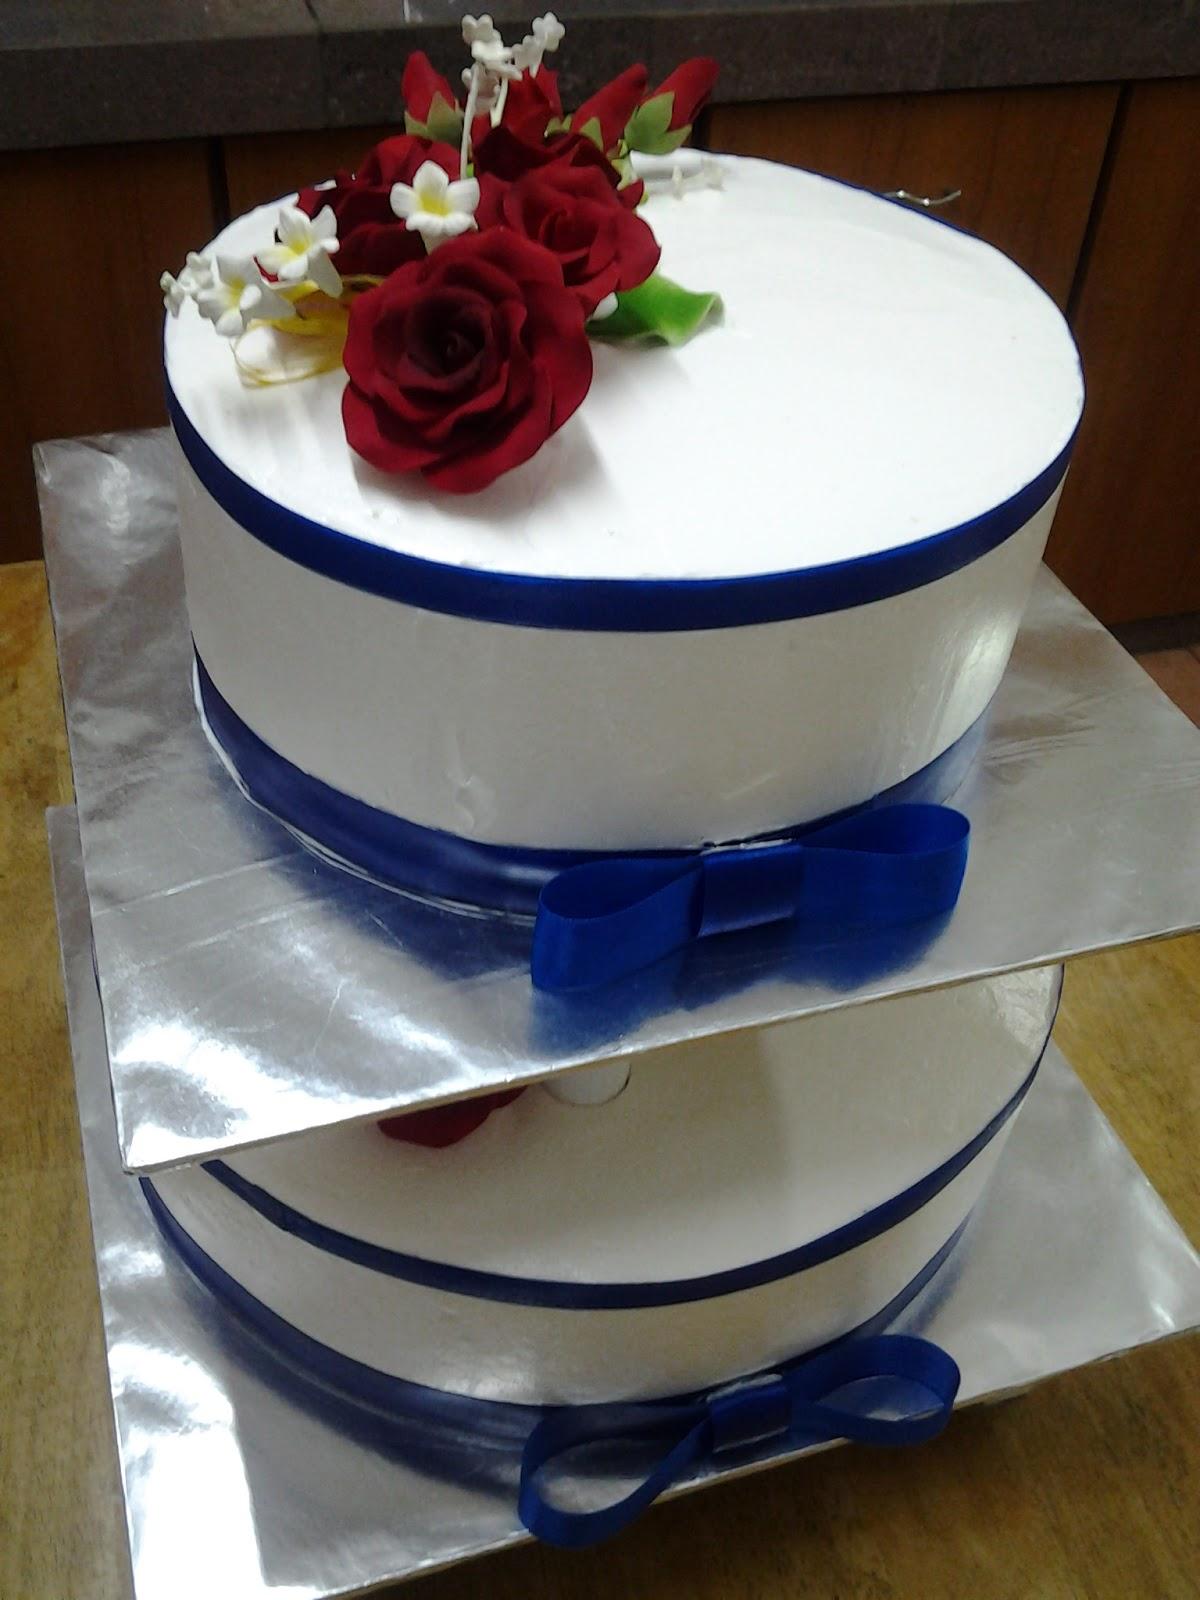 Ct Hasanah Cake House Blue And White 2 Tier Wedding Cake